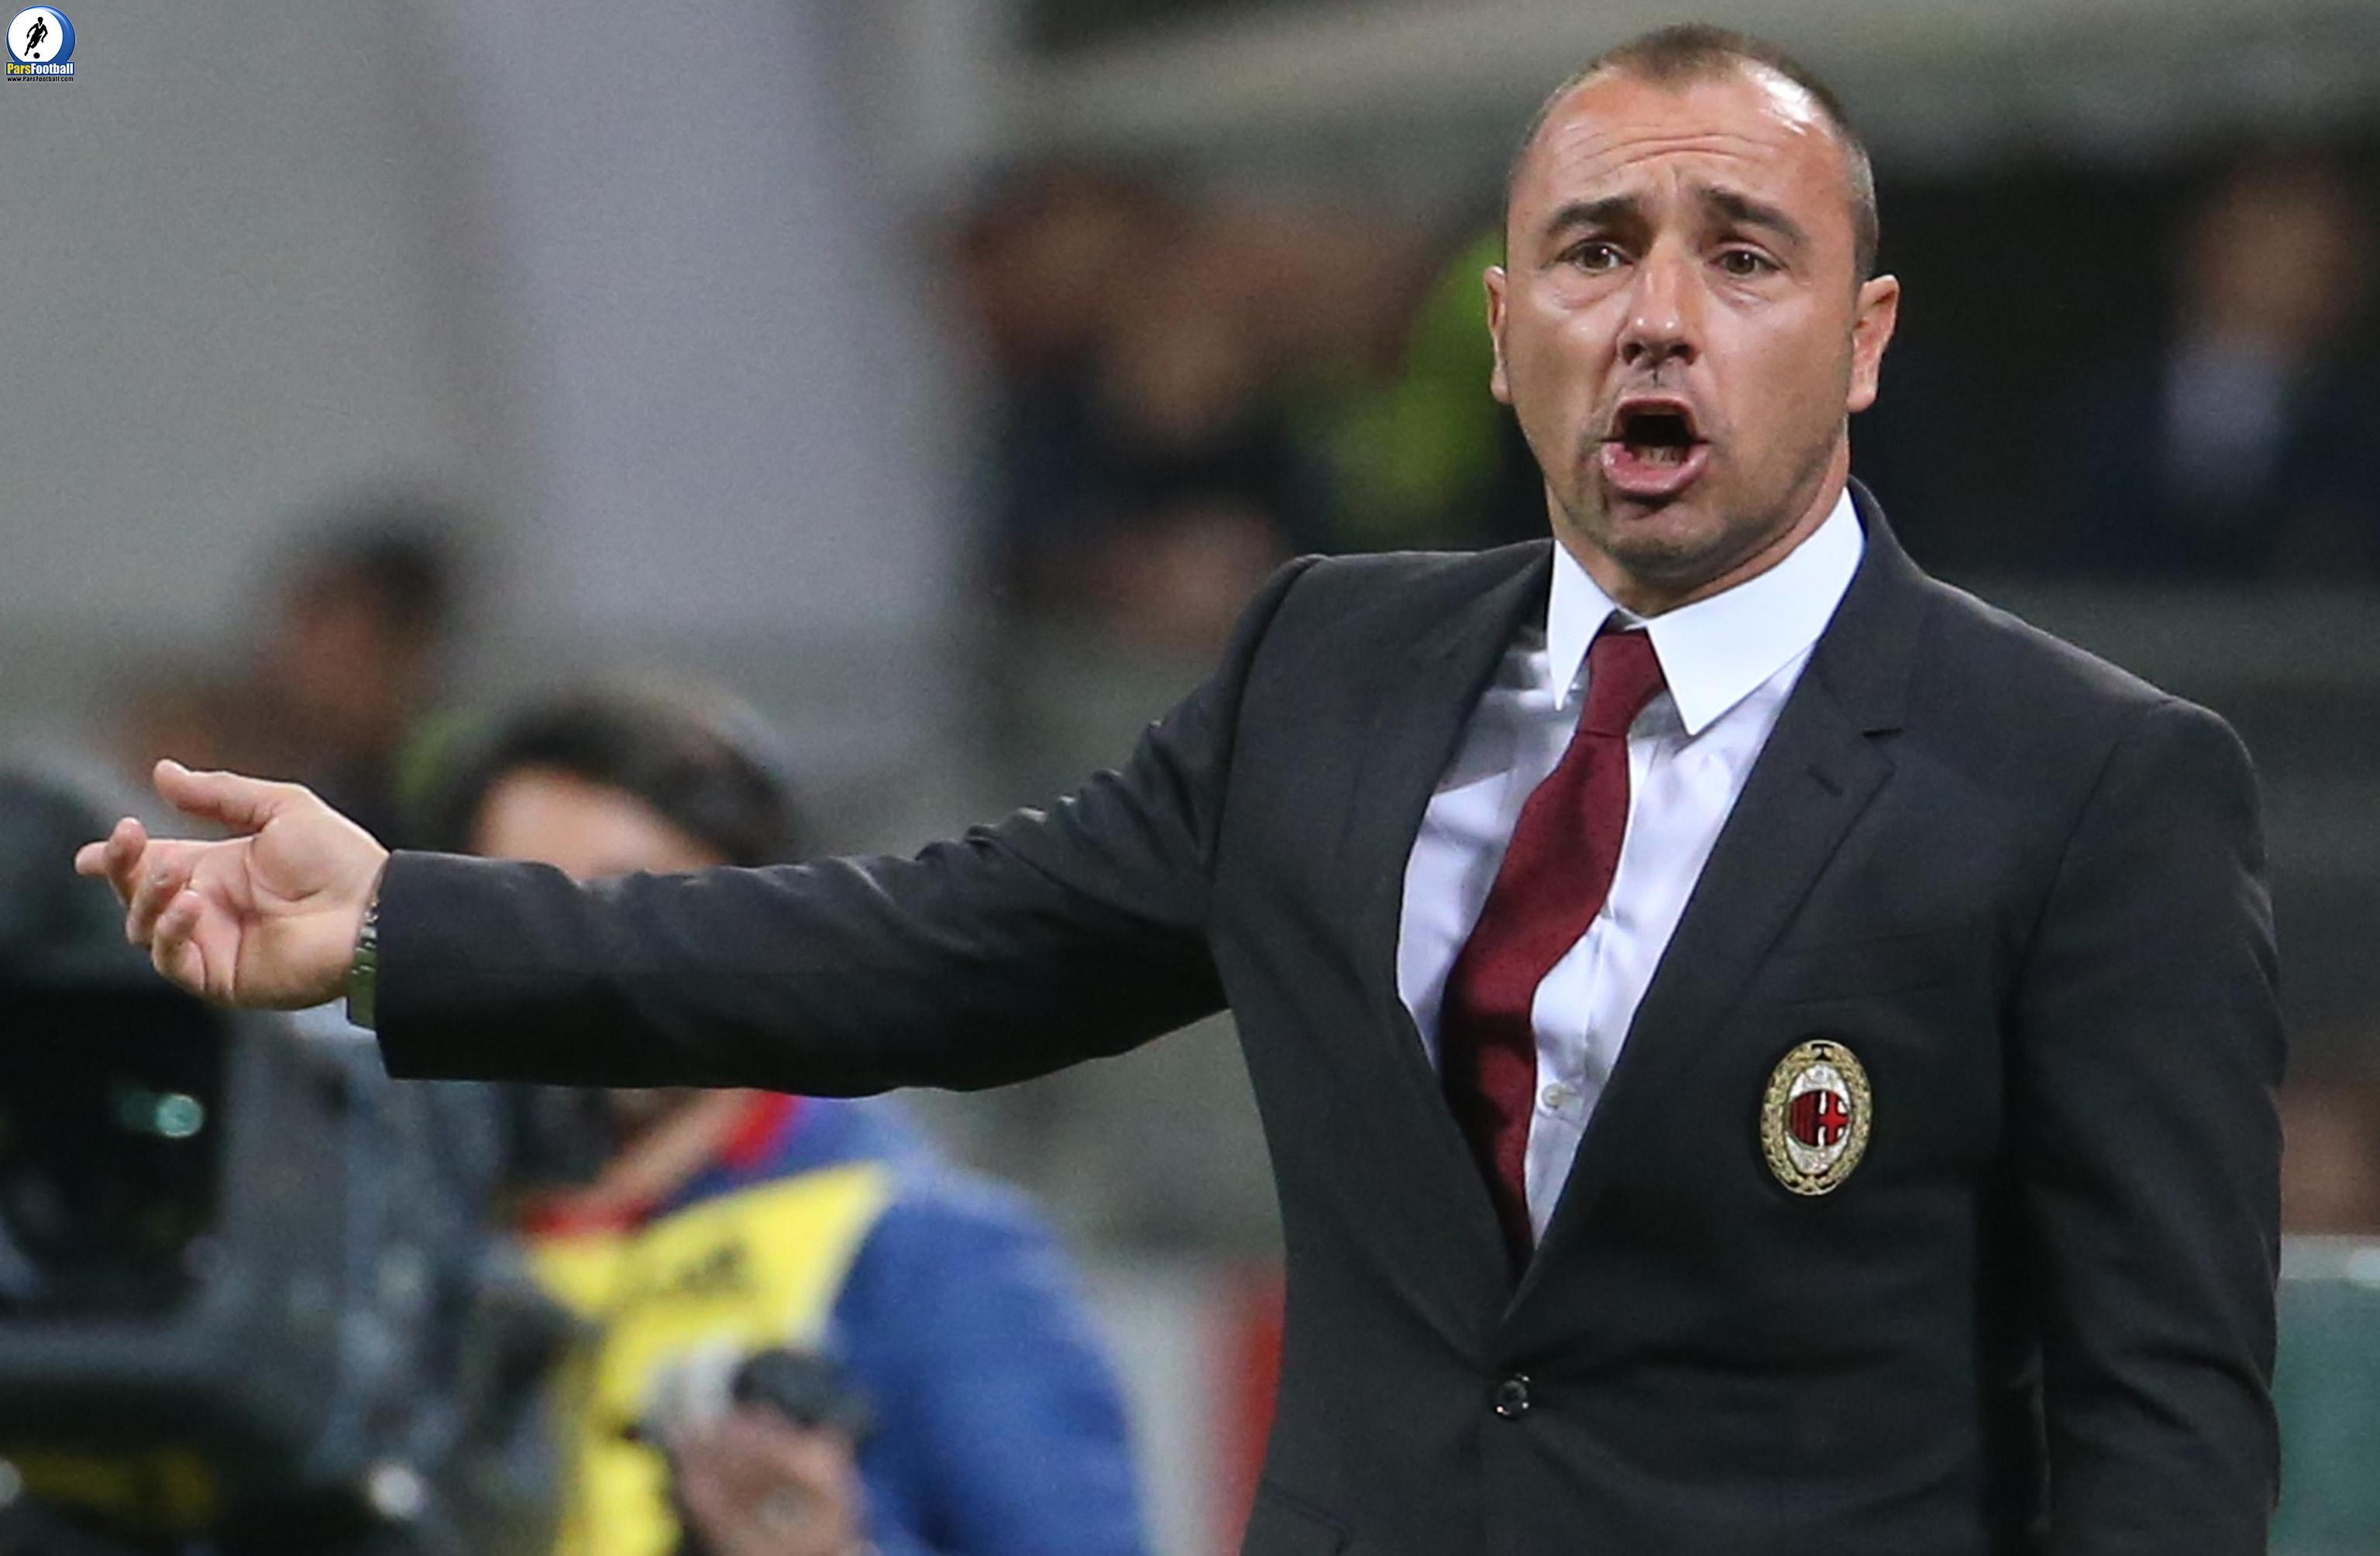 Milan's coach Cristian Brocchi gestures during the Italian Serie A soccer match AC Milan vs Carpi FC at Giuseppe Meazza stadium in Milan, Italy, 21 April 2016. ANSA/MATTEO BAZZI